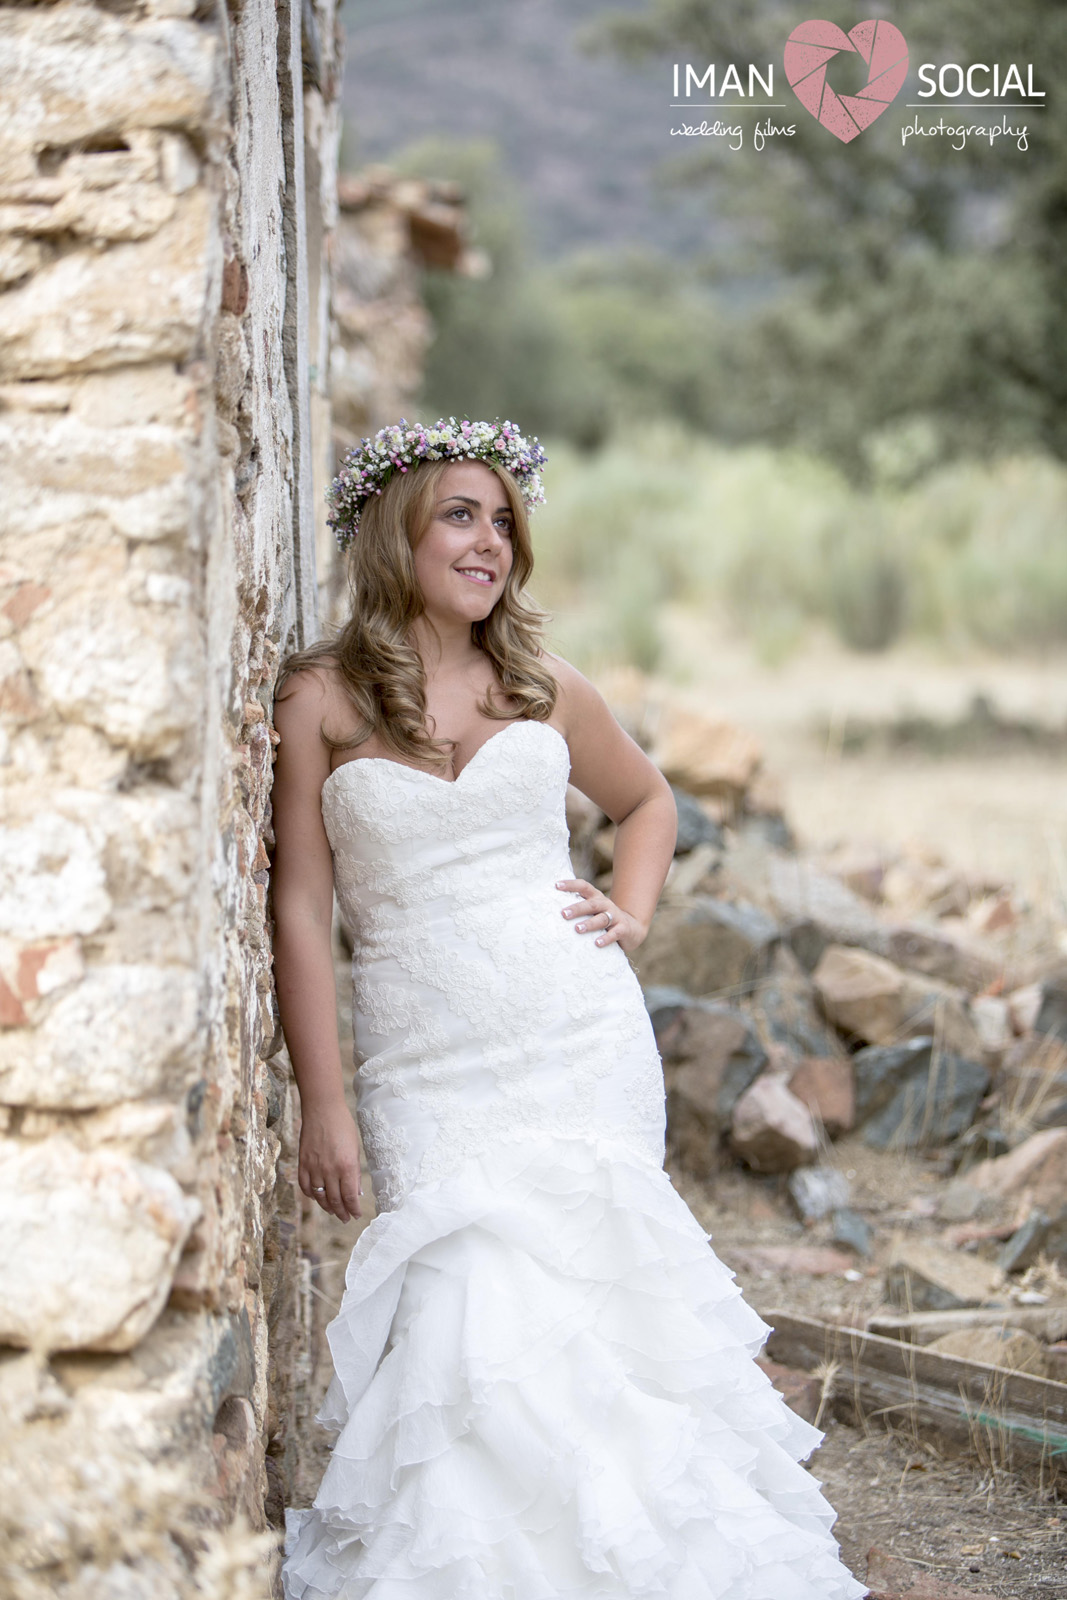 77B0182 Juan Antonio y Mónica - Postboda - video boda cordoba